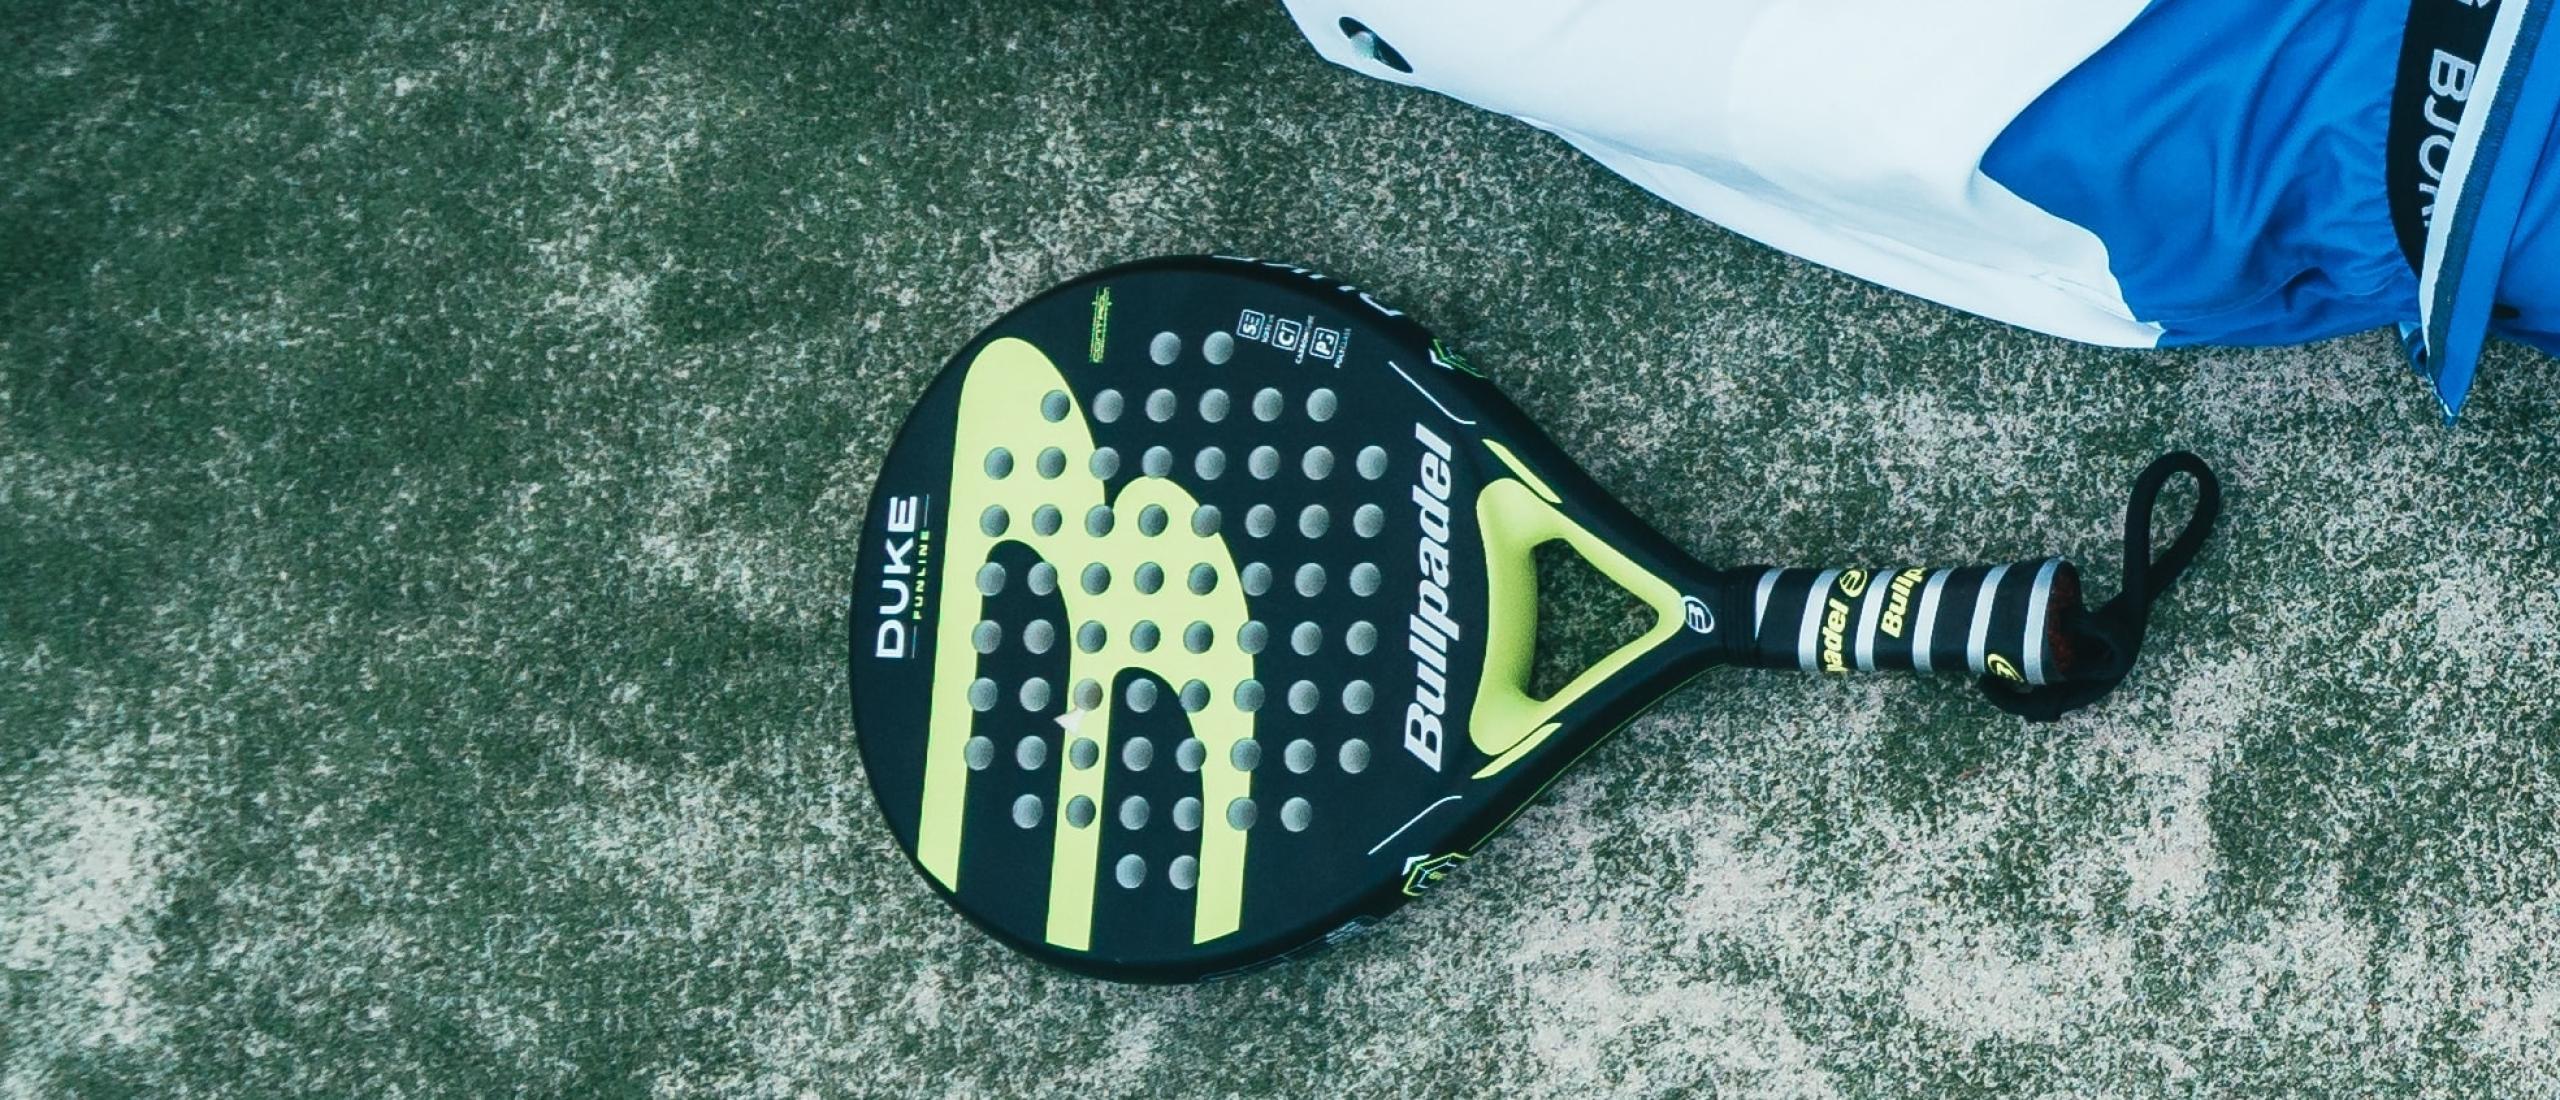 First padel racket